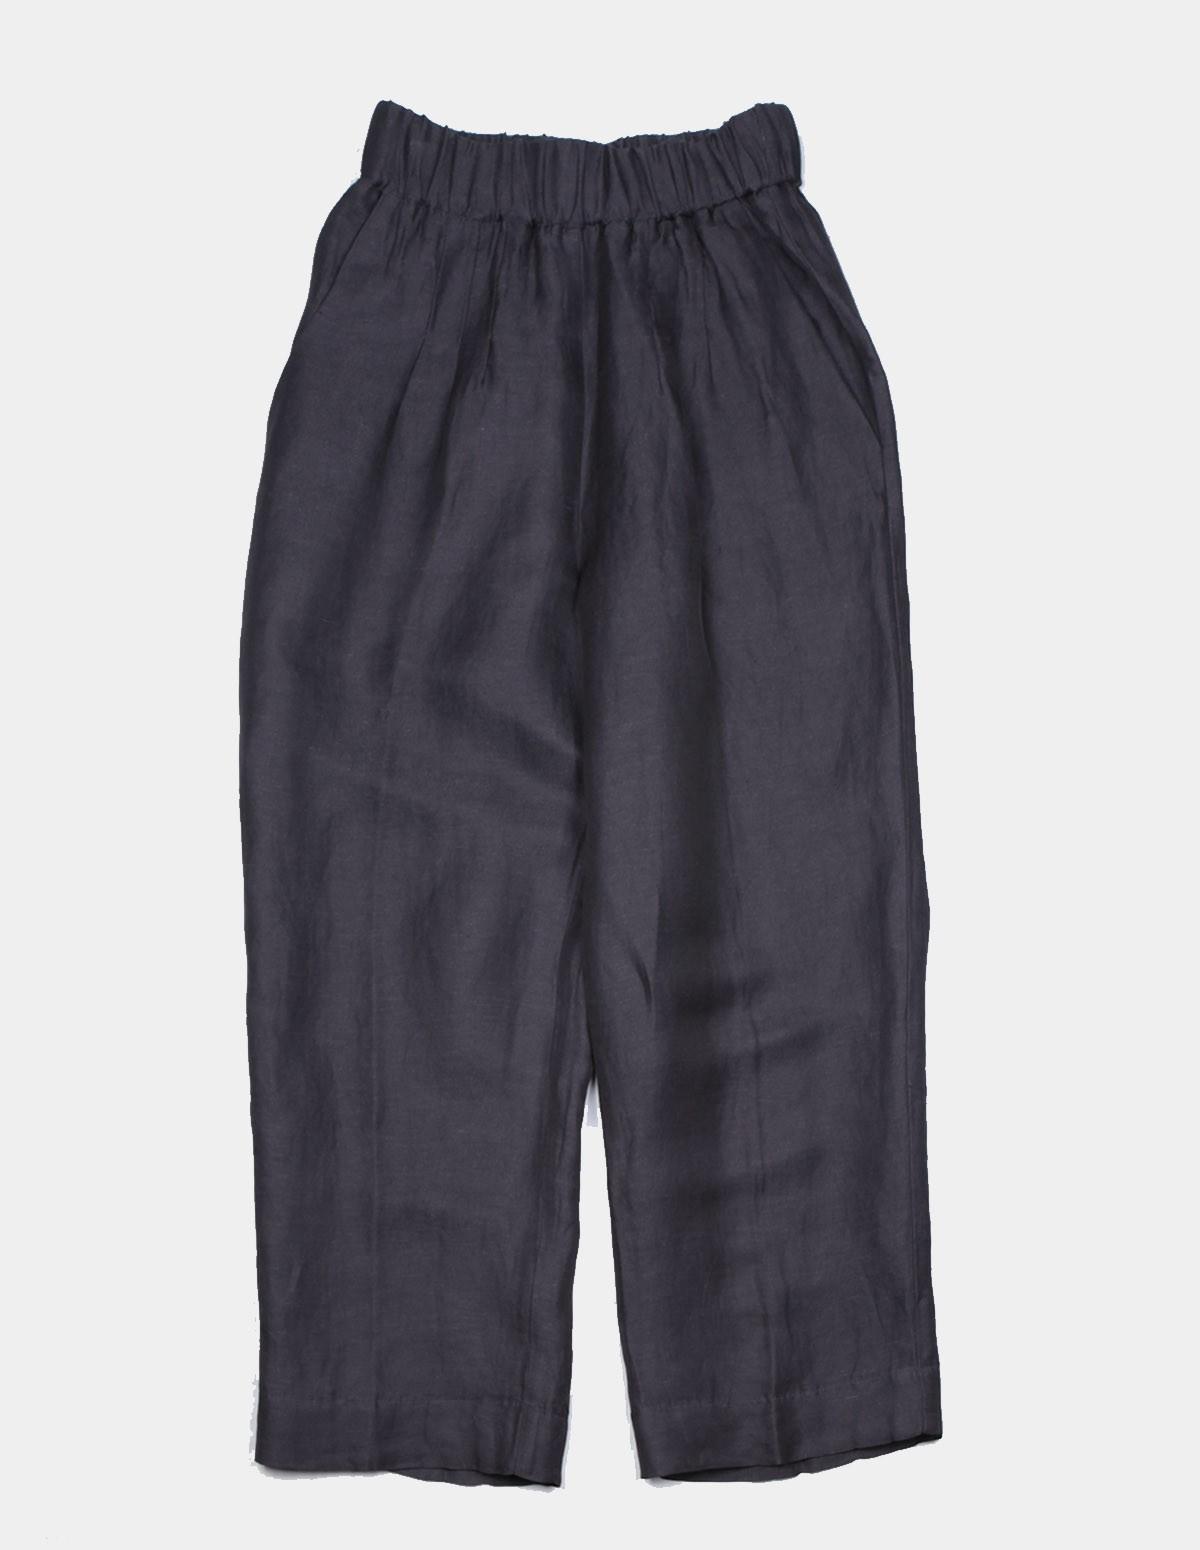 Pom 7142f/50764 Pants - 99 NOIR